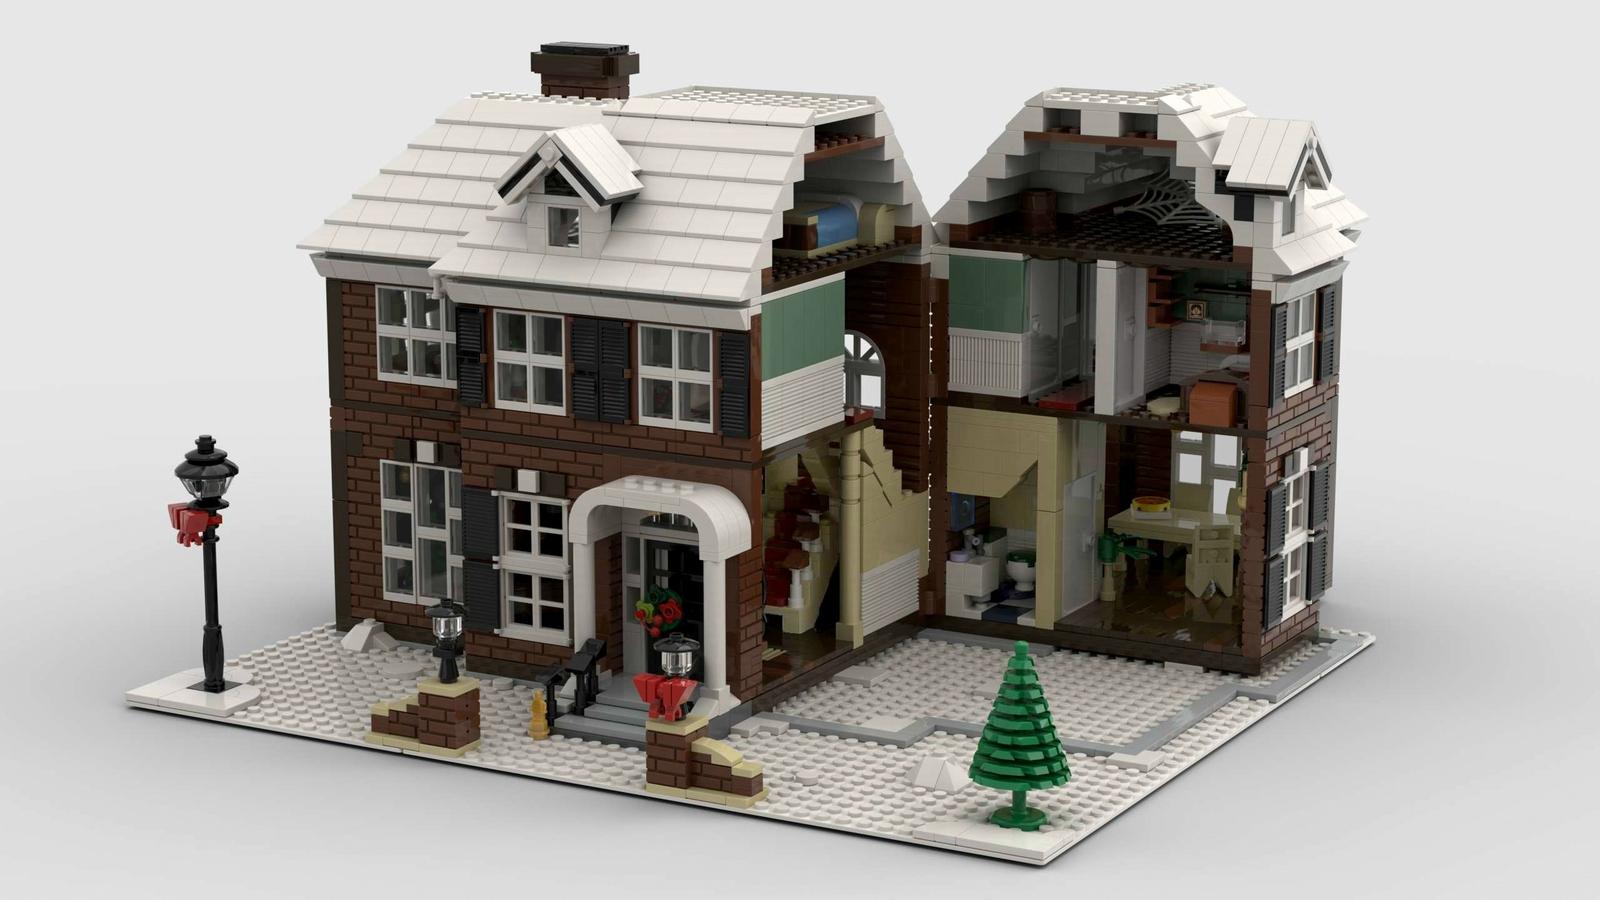 lego-ideas-home-alone-aufklappen-adwind zusammengebaut.com